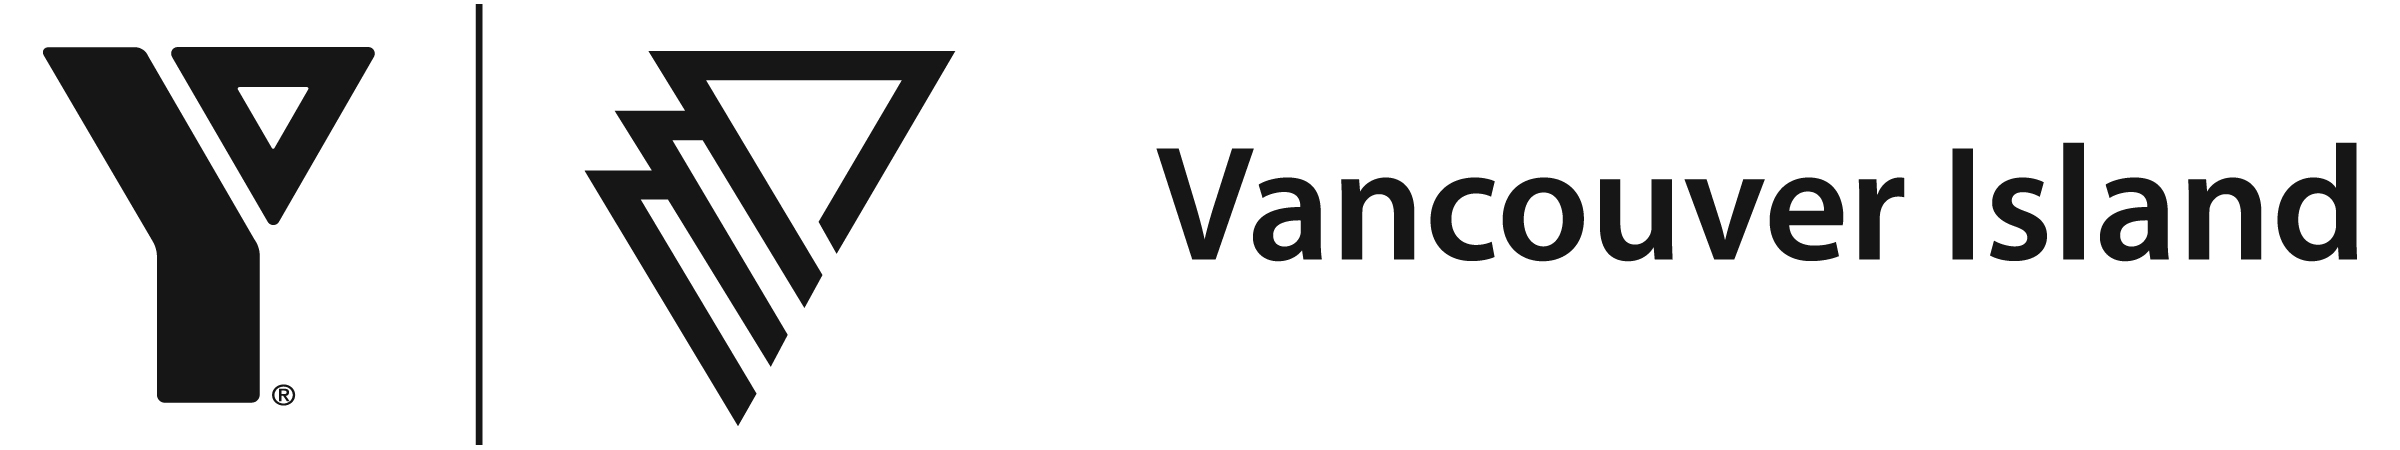 YMCA-YWCA Vancouver Island.jpg